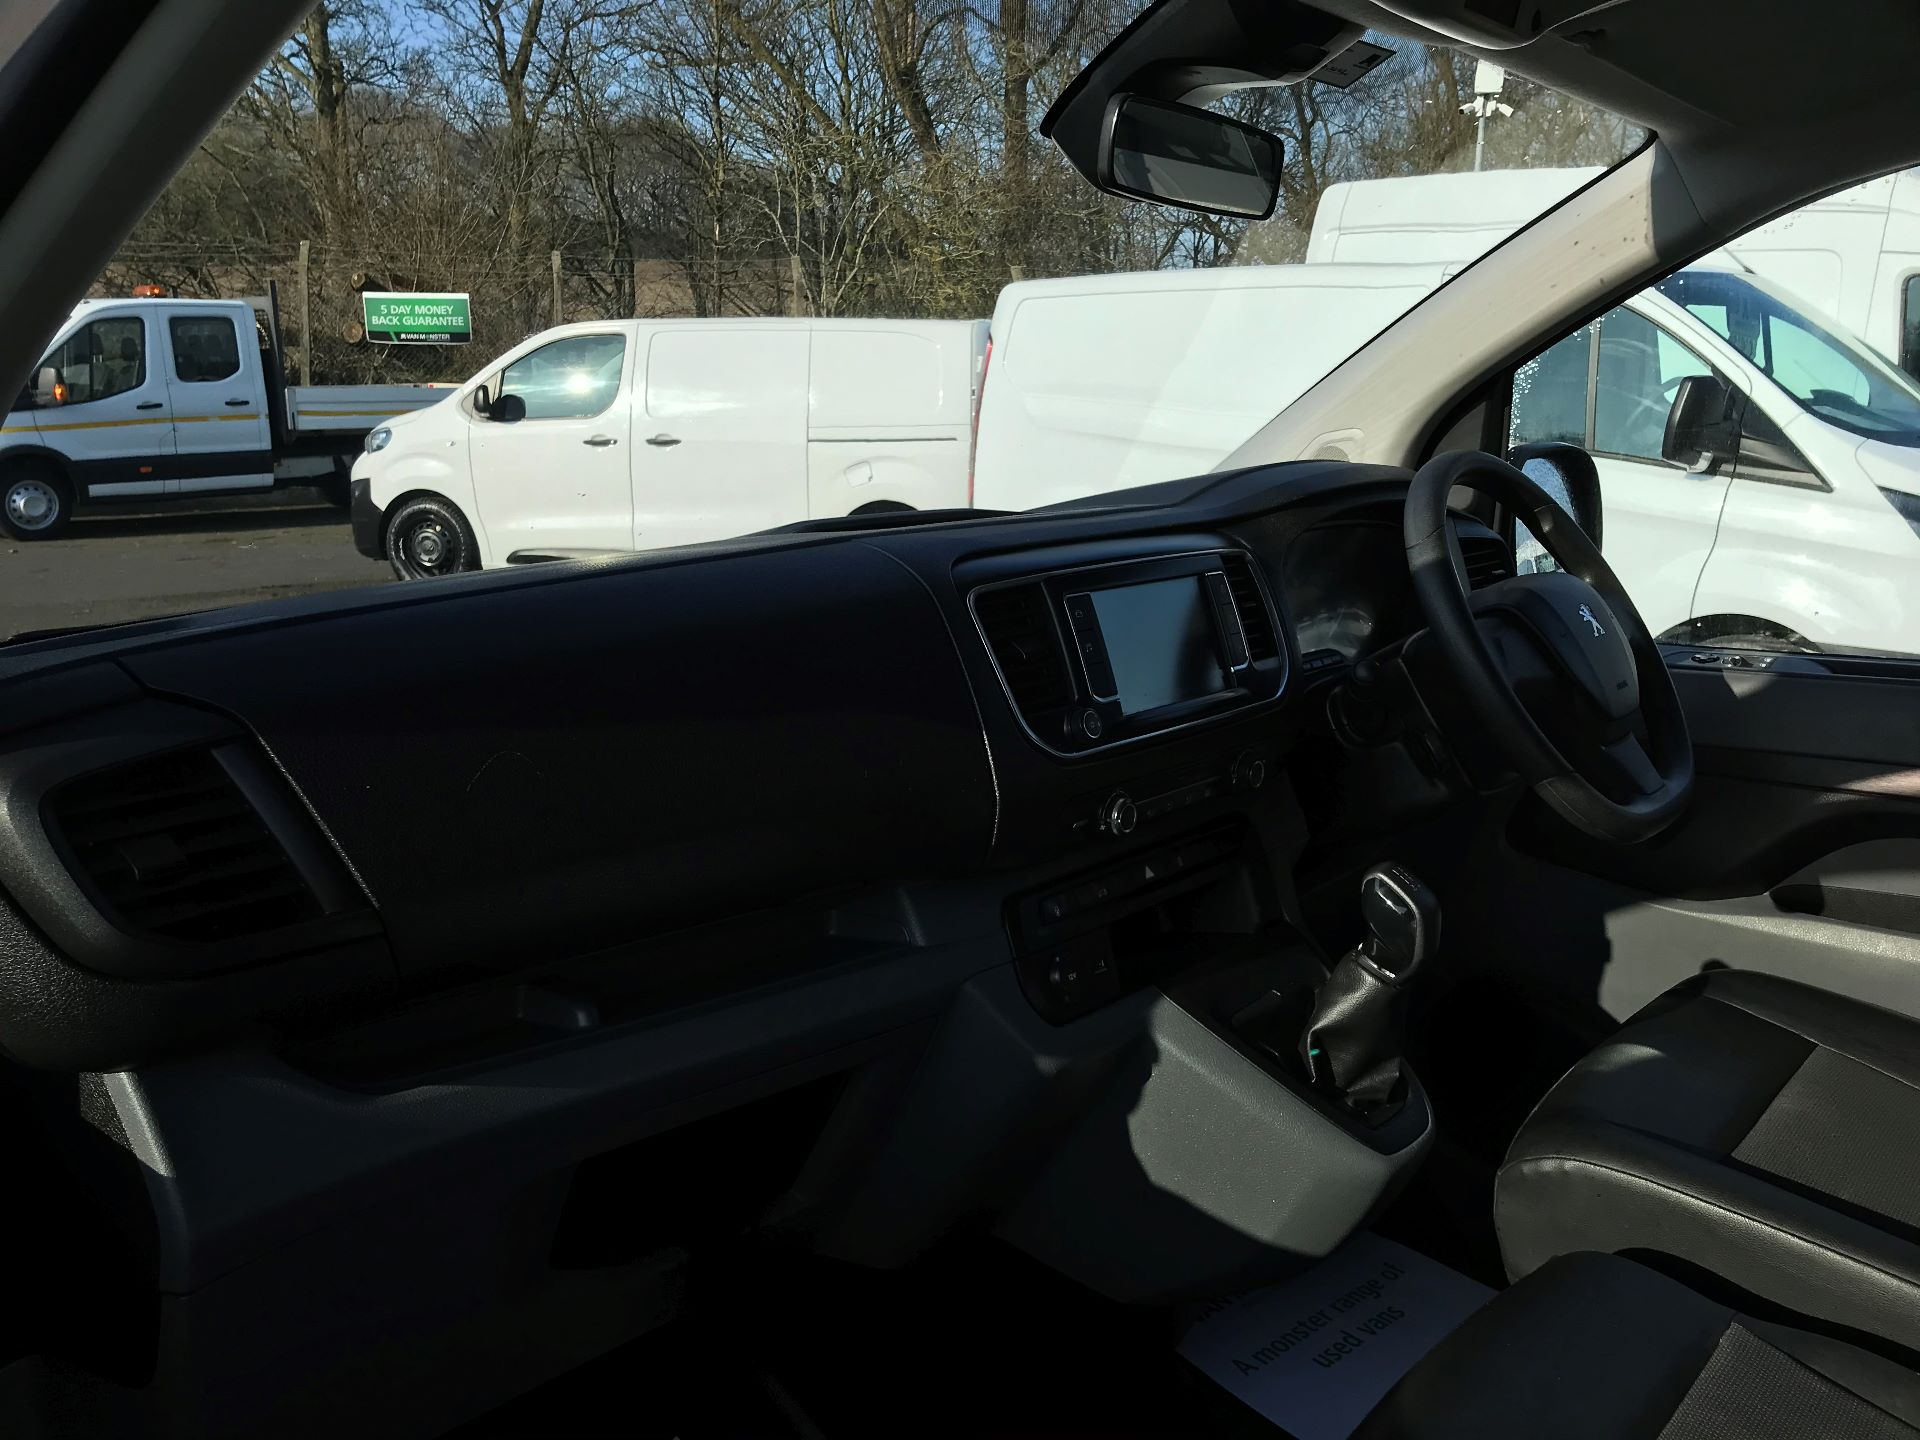 2018 Peugeot Expert STANDARD 1000 1.6 BLUEHDI 95 PROFESSIONAL EURO 6 (NU18MVC) Image 15